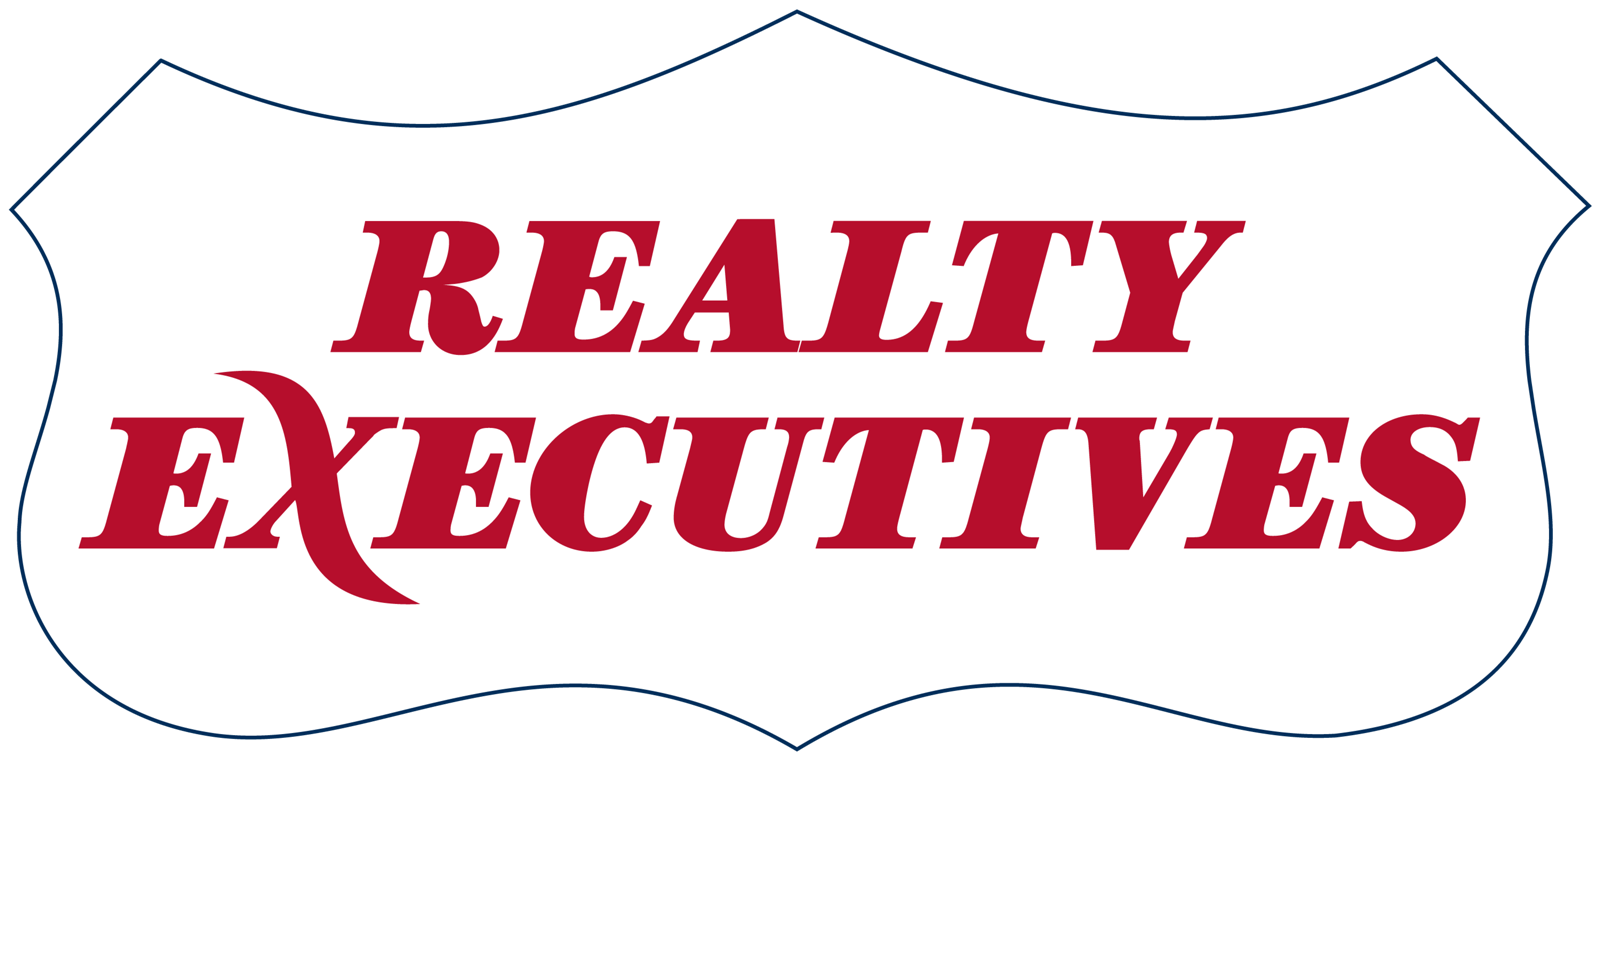 Realty Executives Saskatoon logo